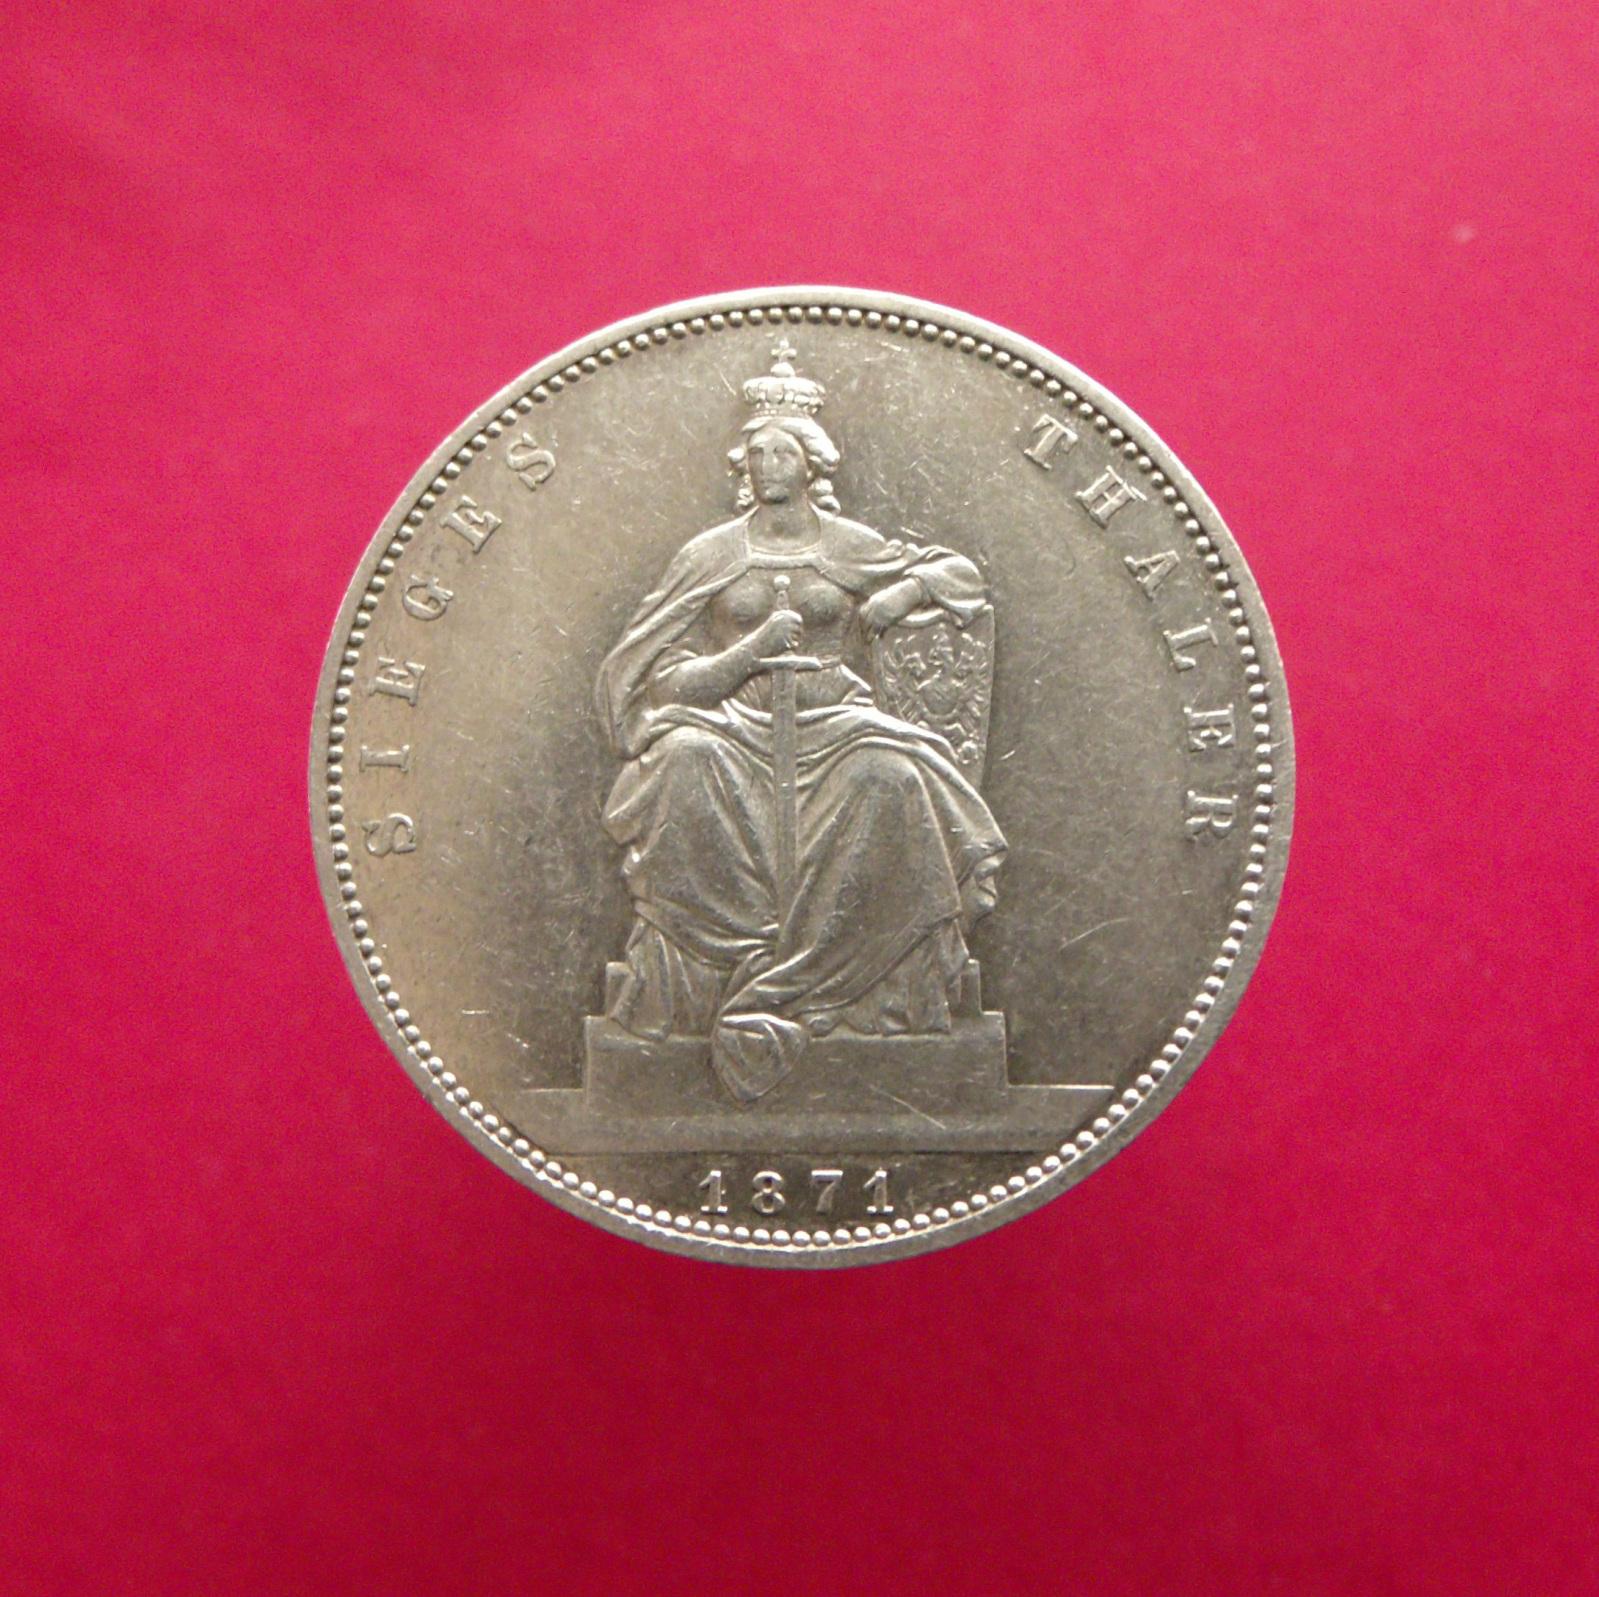 Alemania. Monedas del Reino de Prusia (1701-1918) 2h4c38k